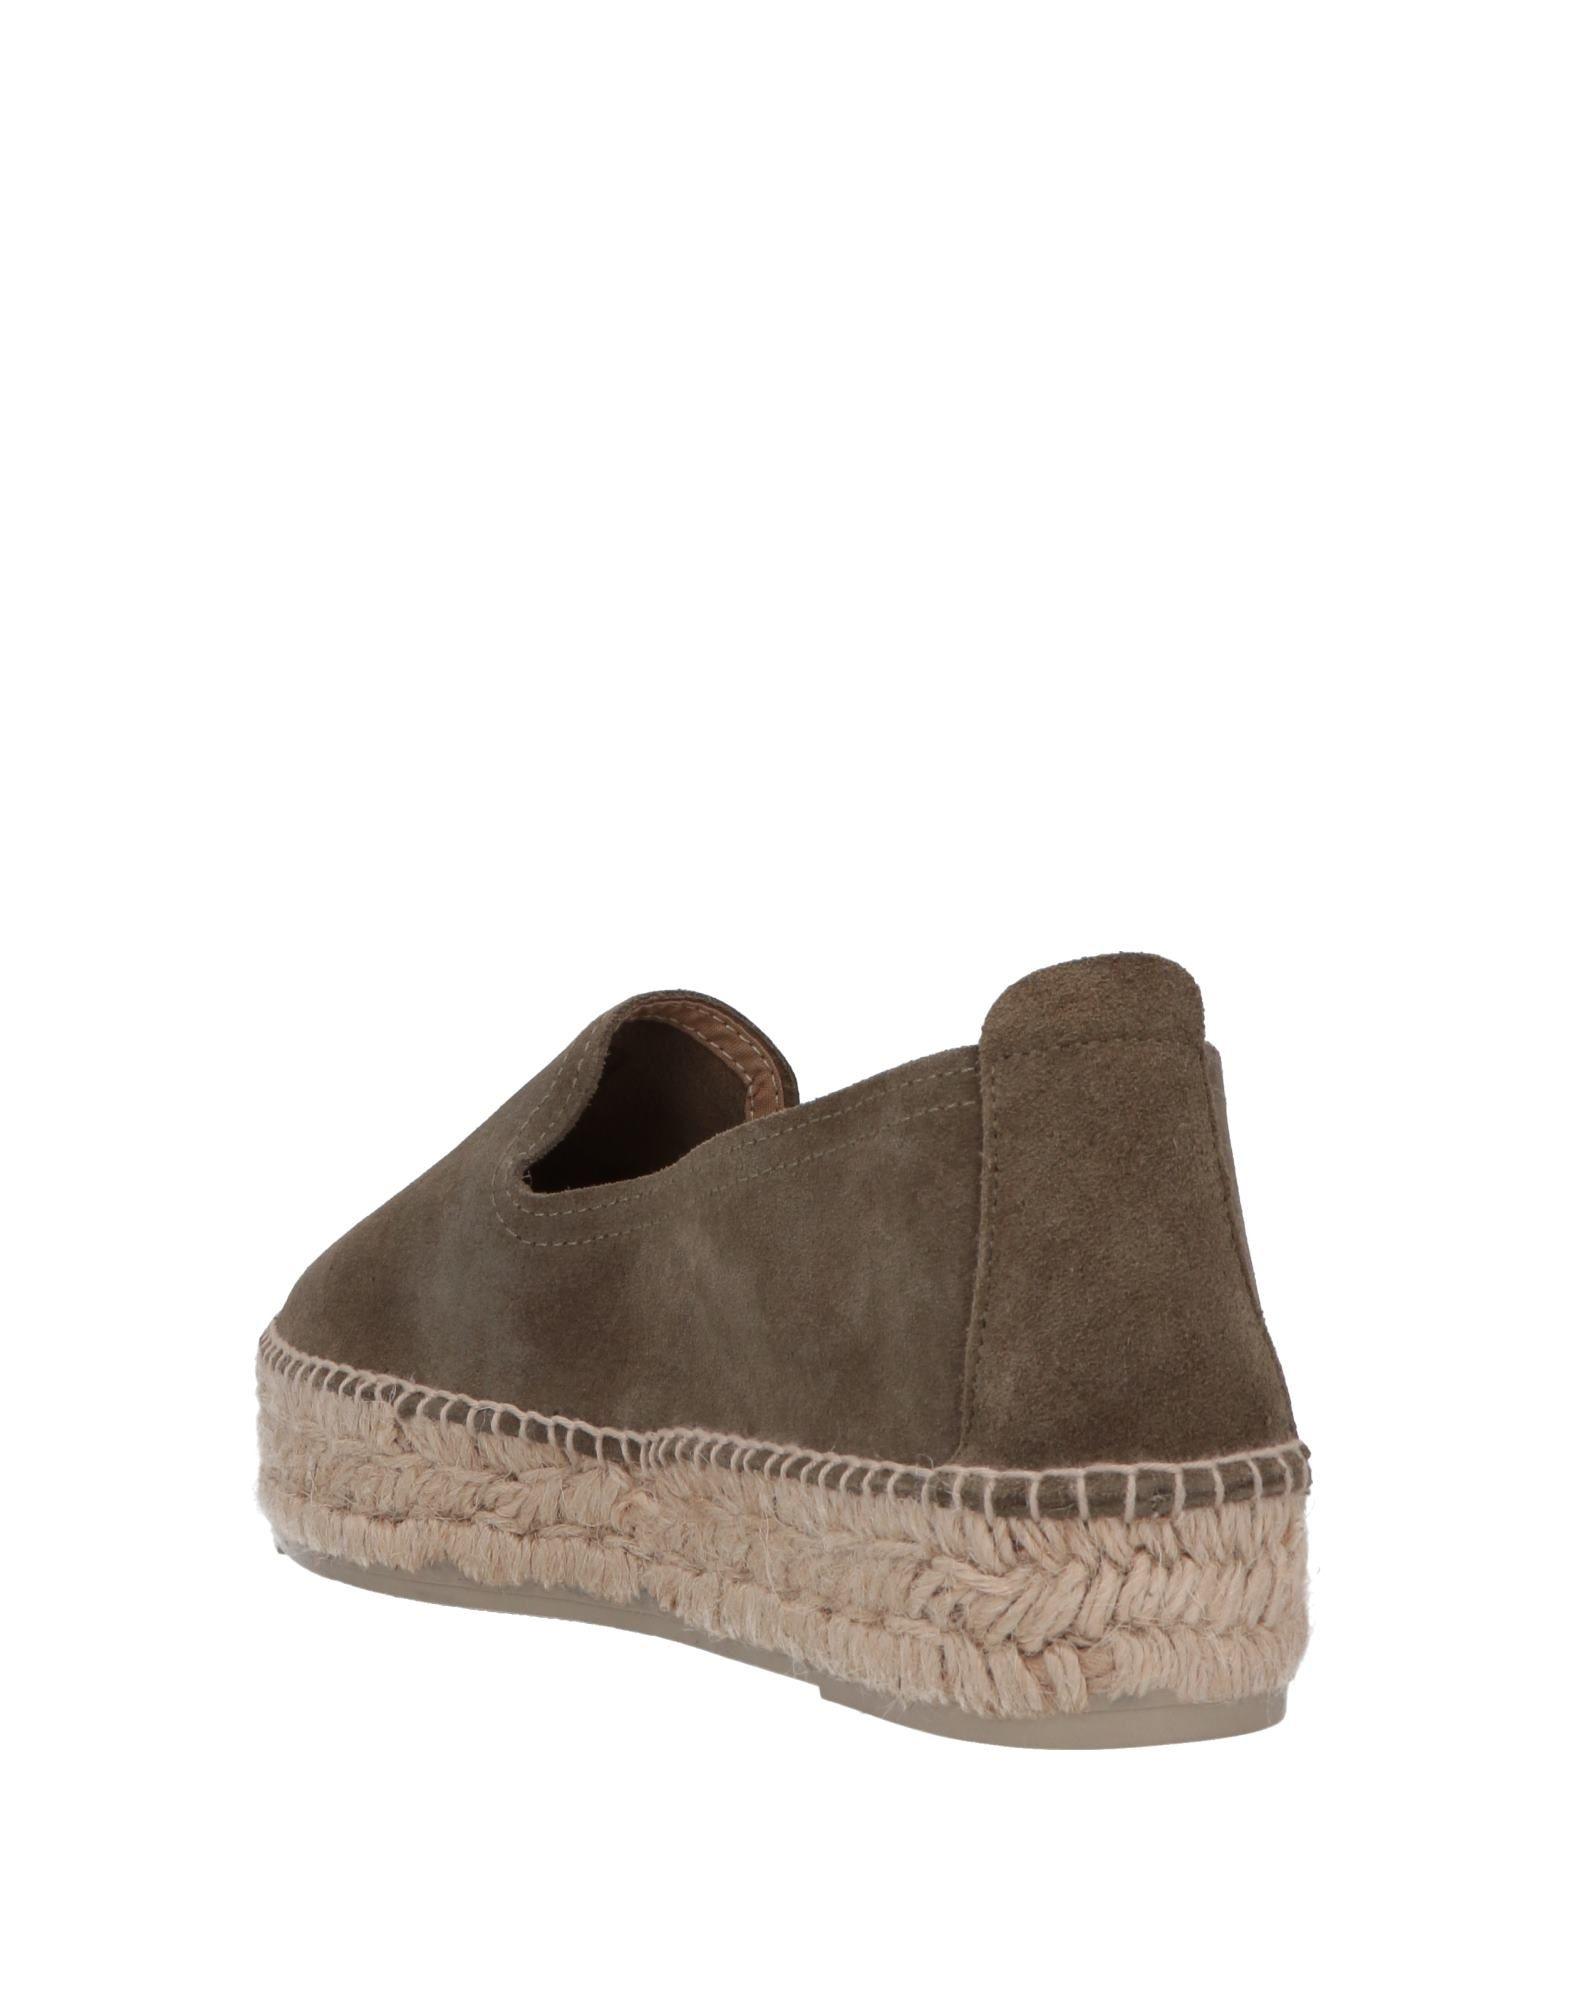 Manebí Espadrilles Damen  11629633UR 11629633UR 11629633UR Gute Qualität beliebte Schuhe 65e6d8